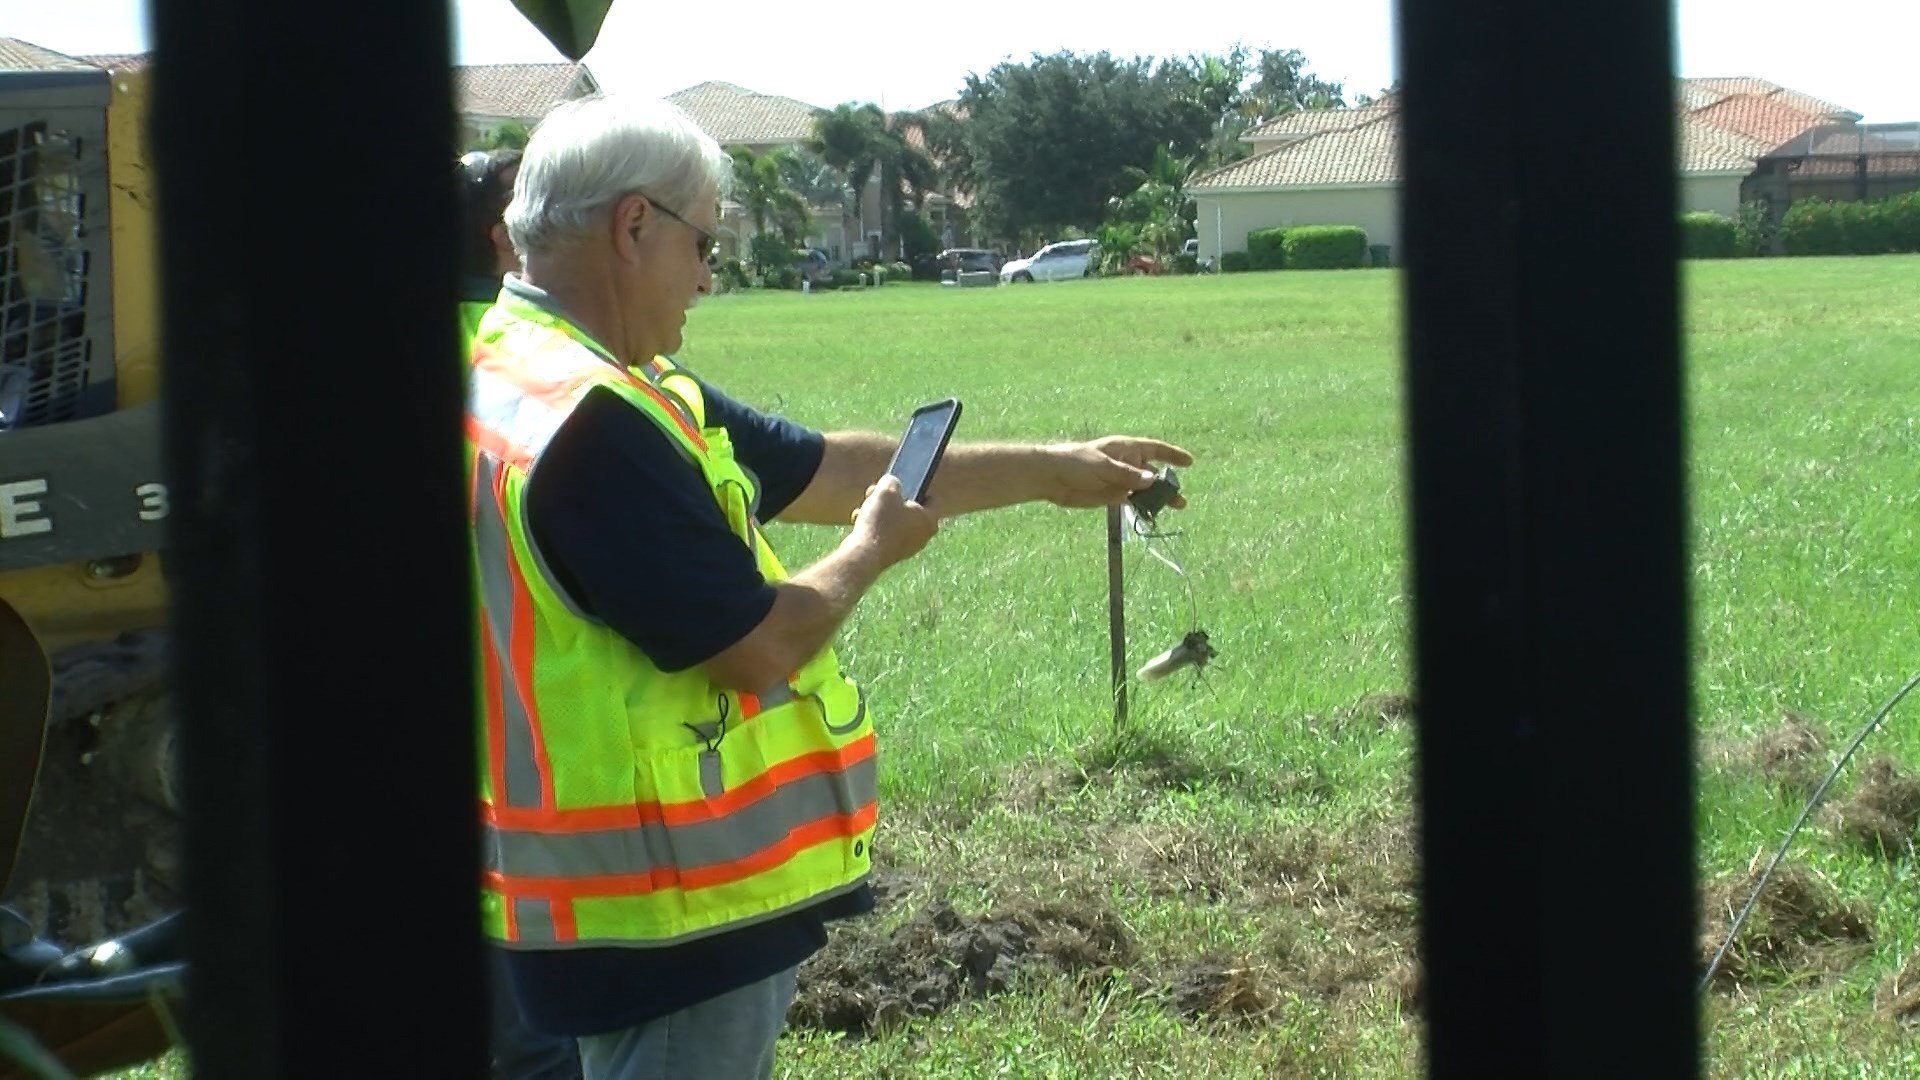 Charlotte - Suncoast News and Weather Sarasota Manatee &